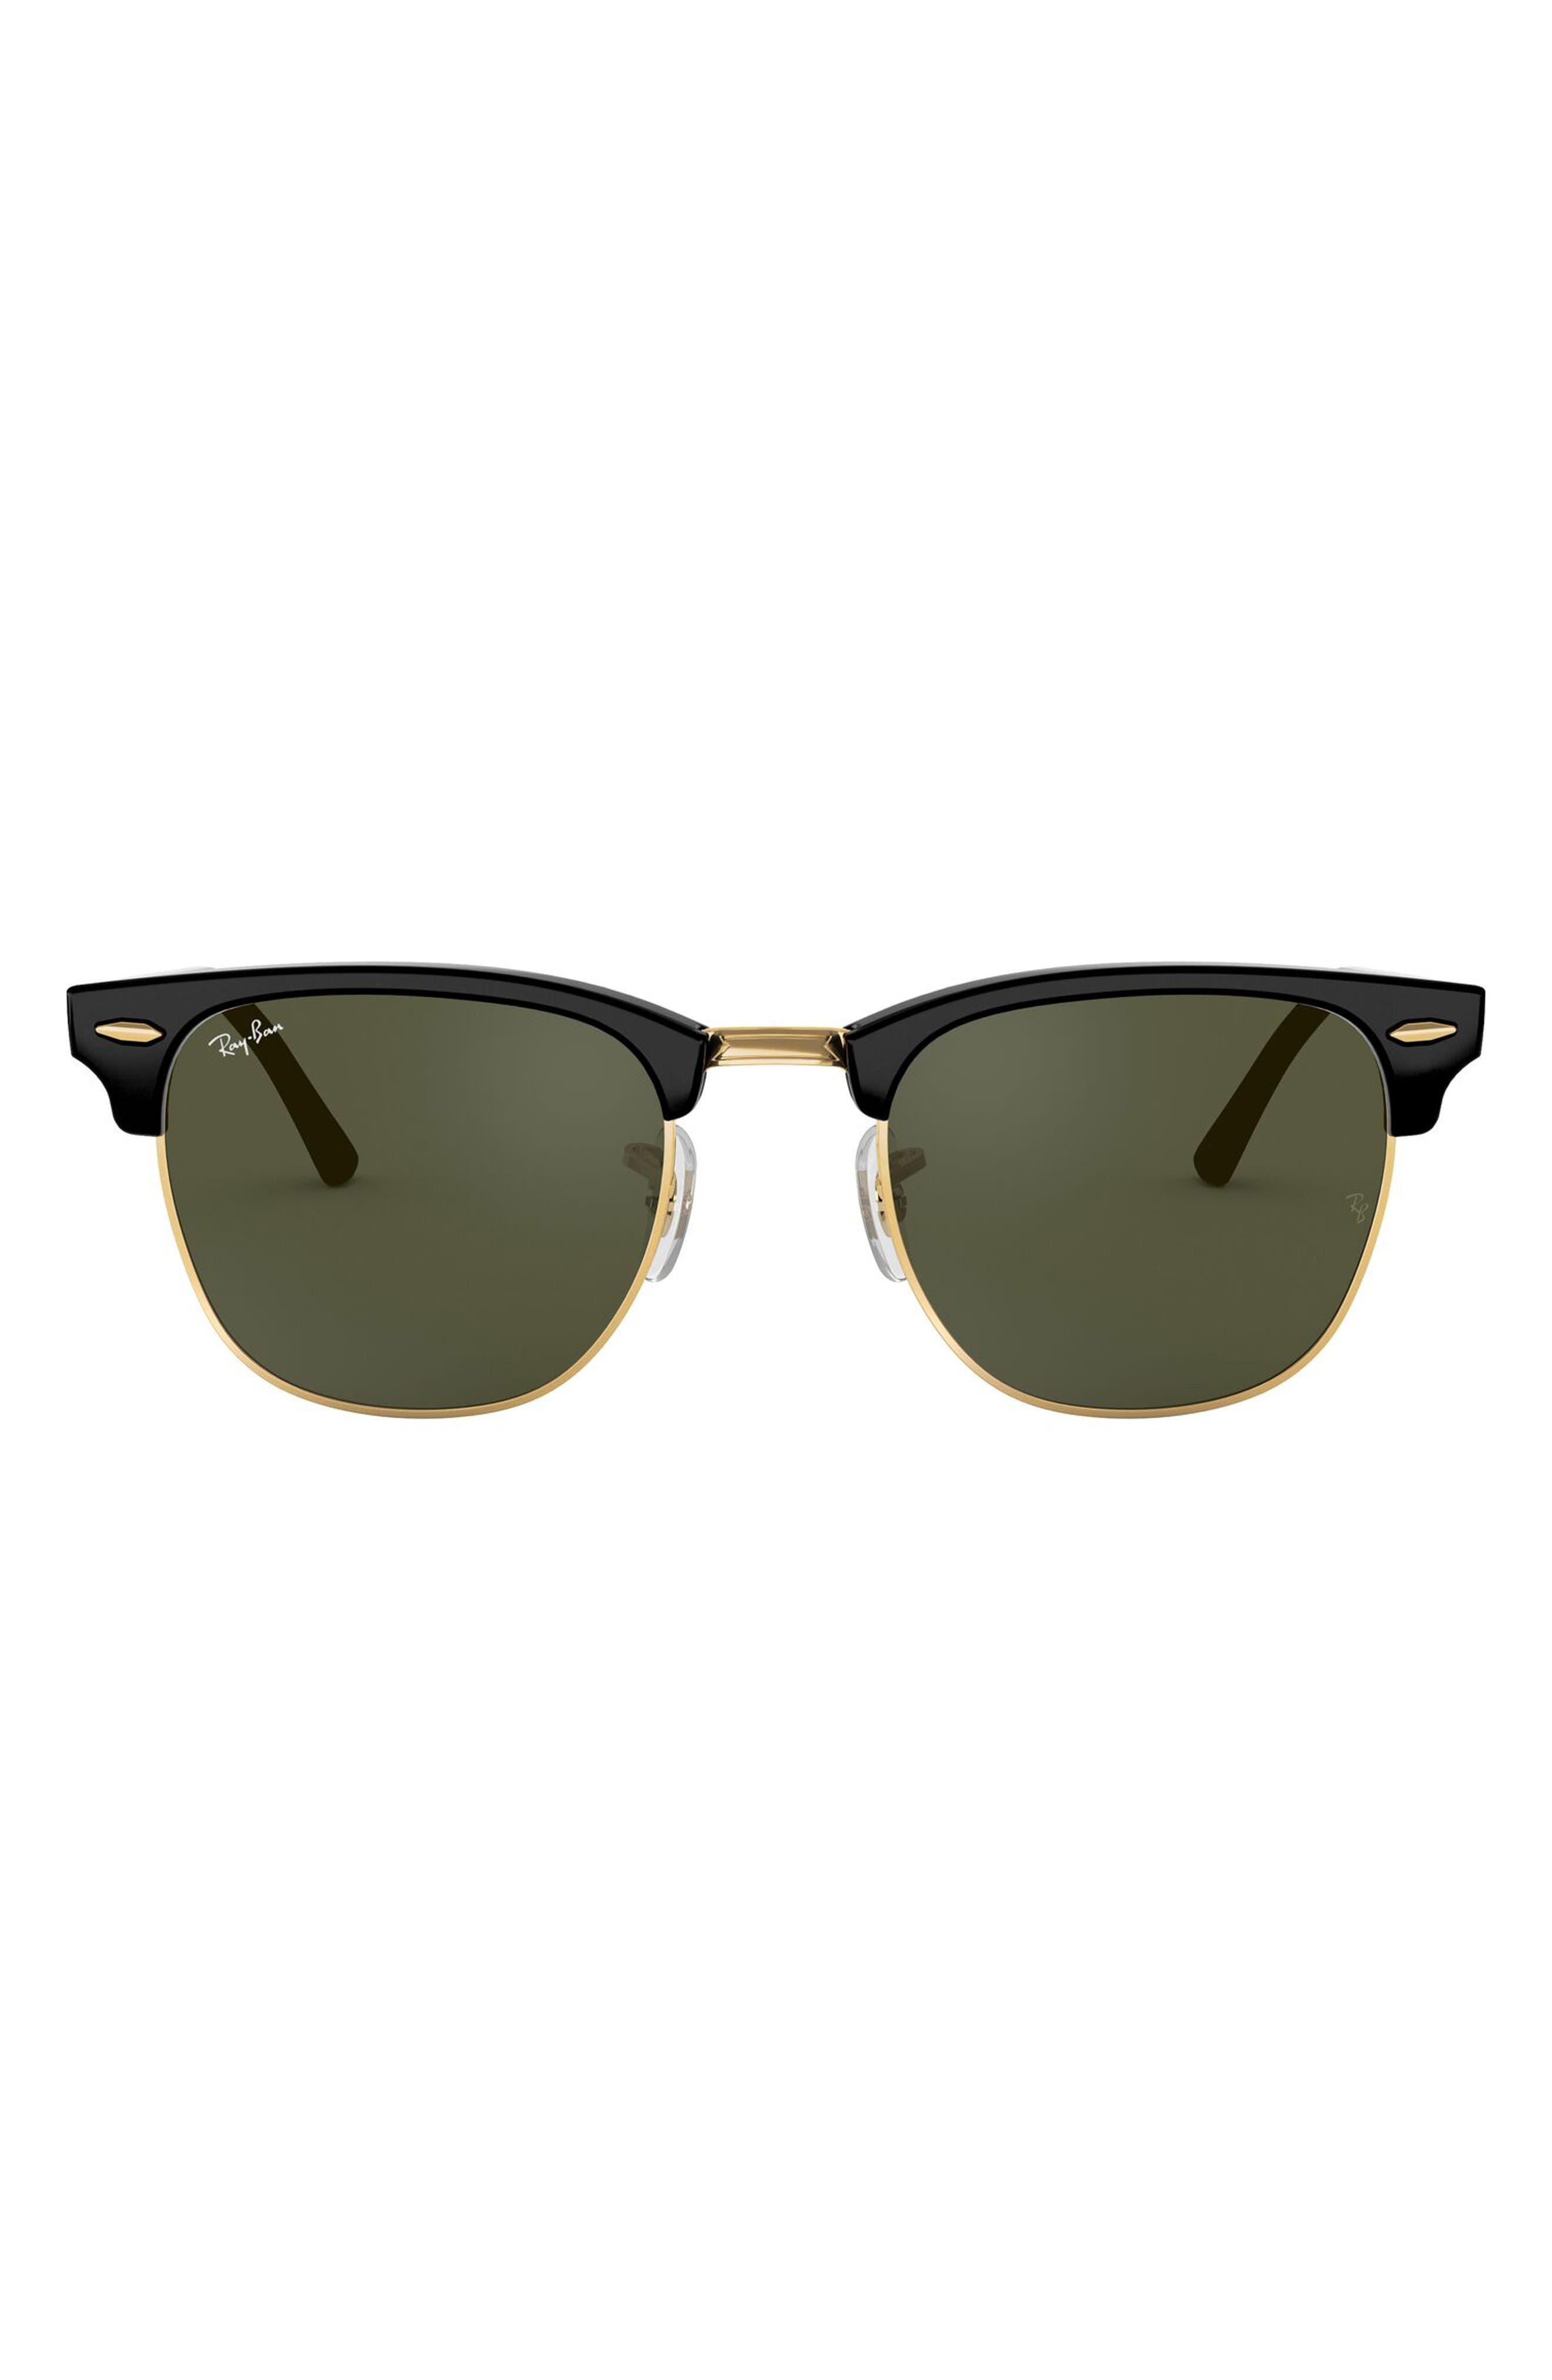 Ray-Ban Clubmaster 51mm Sunglasses - Dark Tortoise